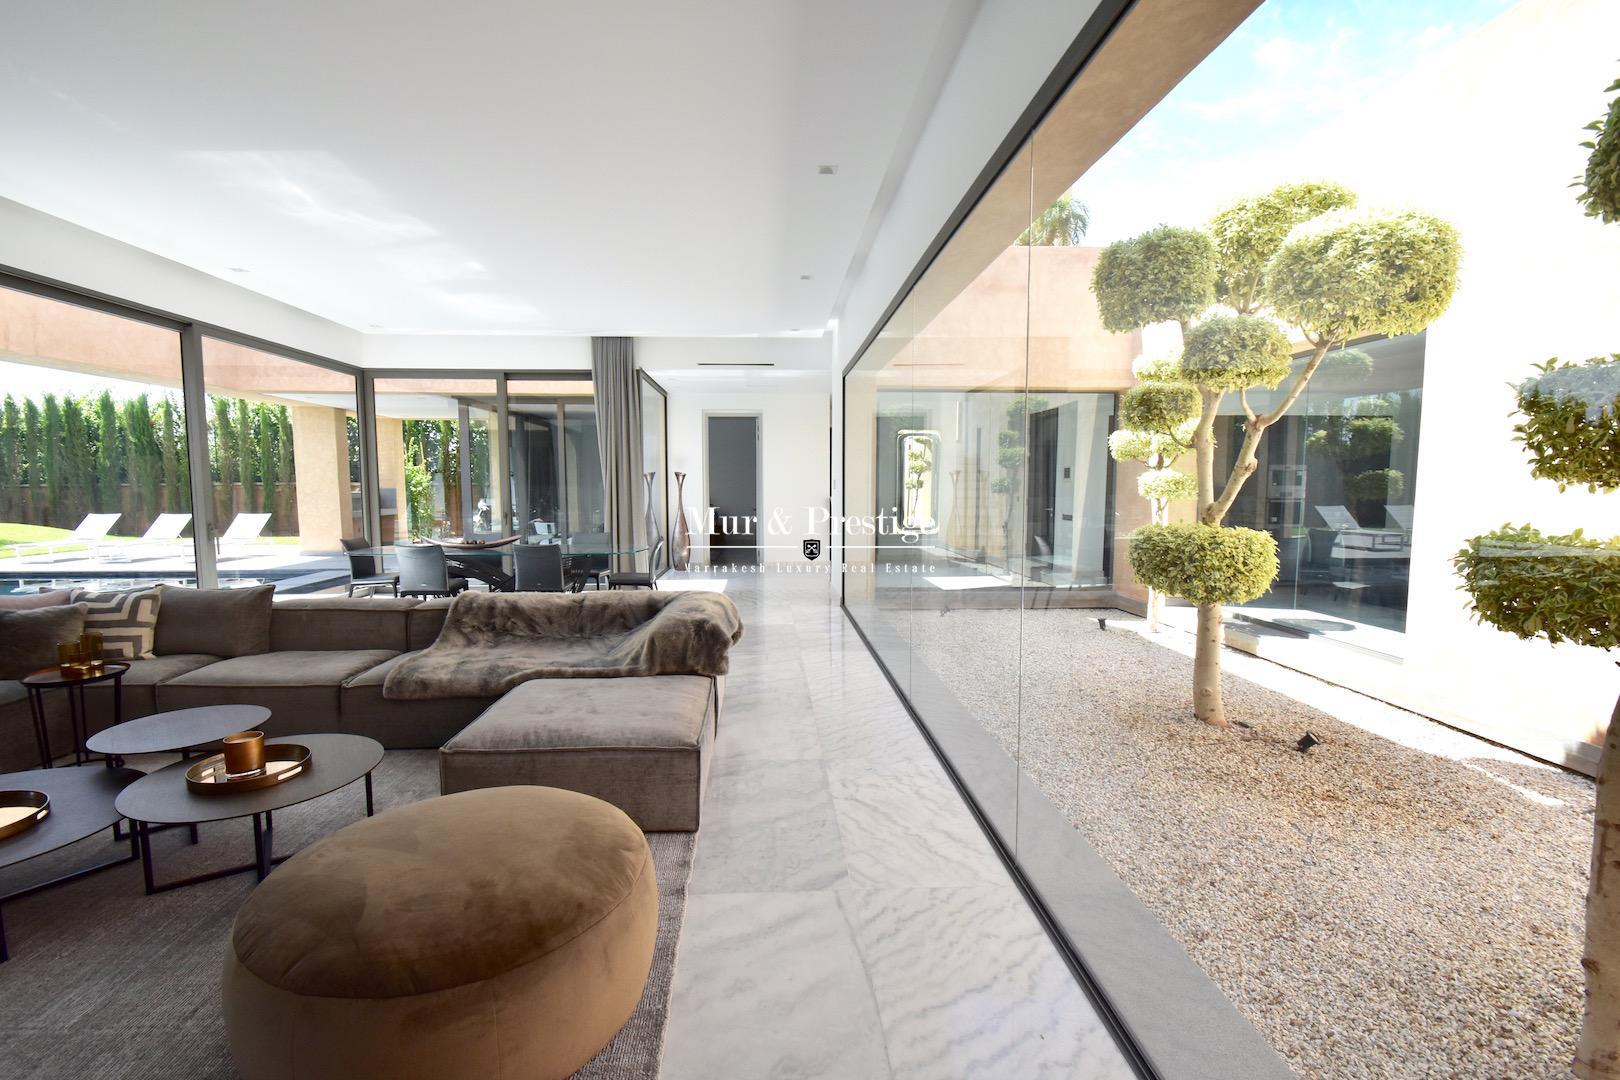 Villa ultra-moderne en vente à Marrakech - copie